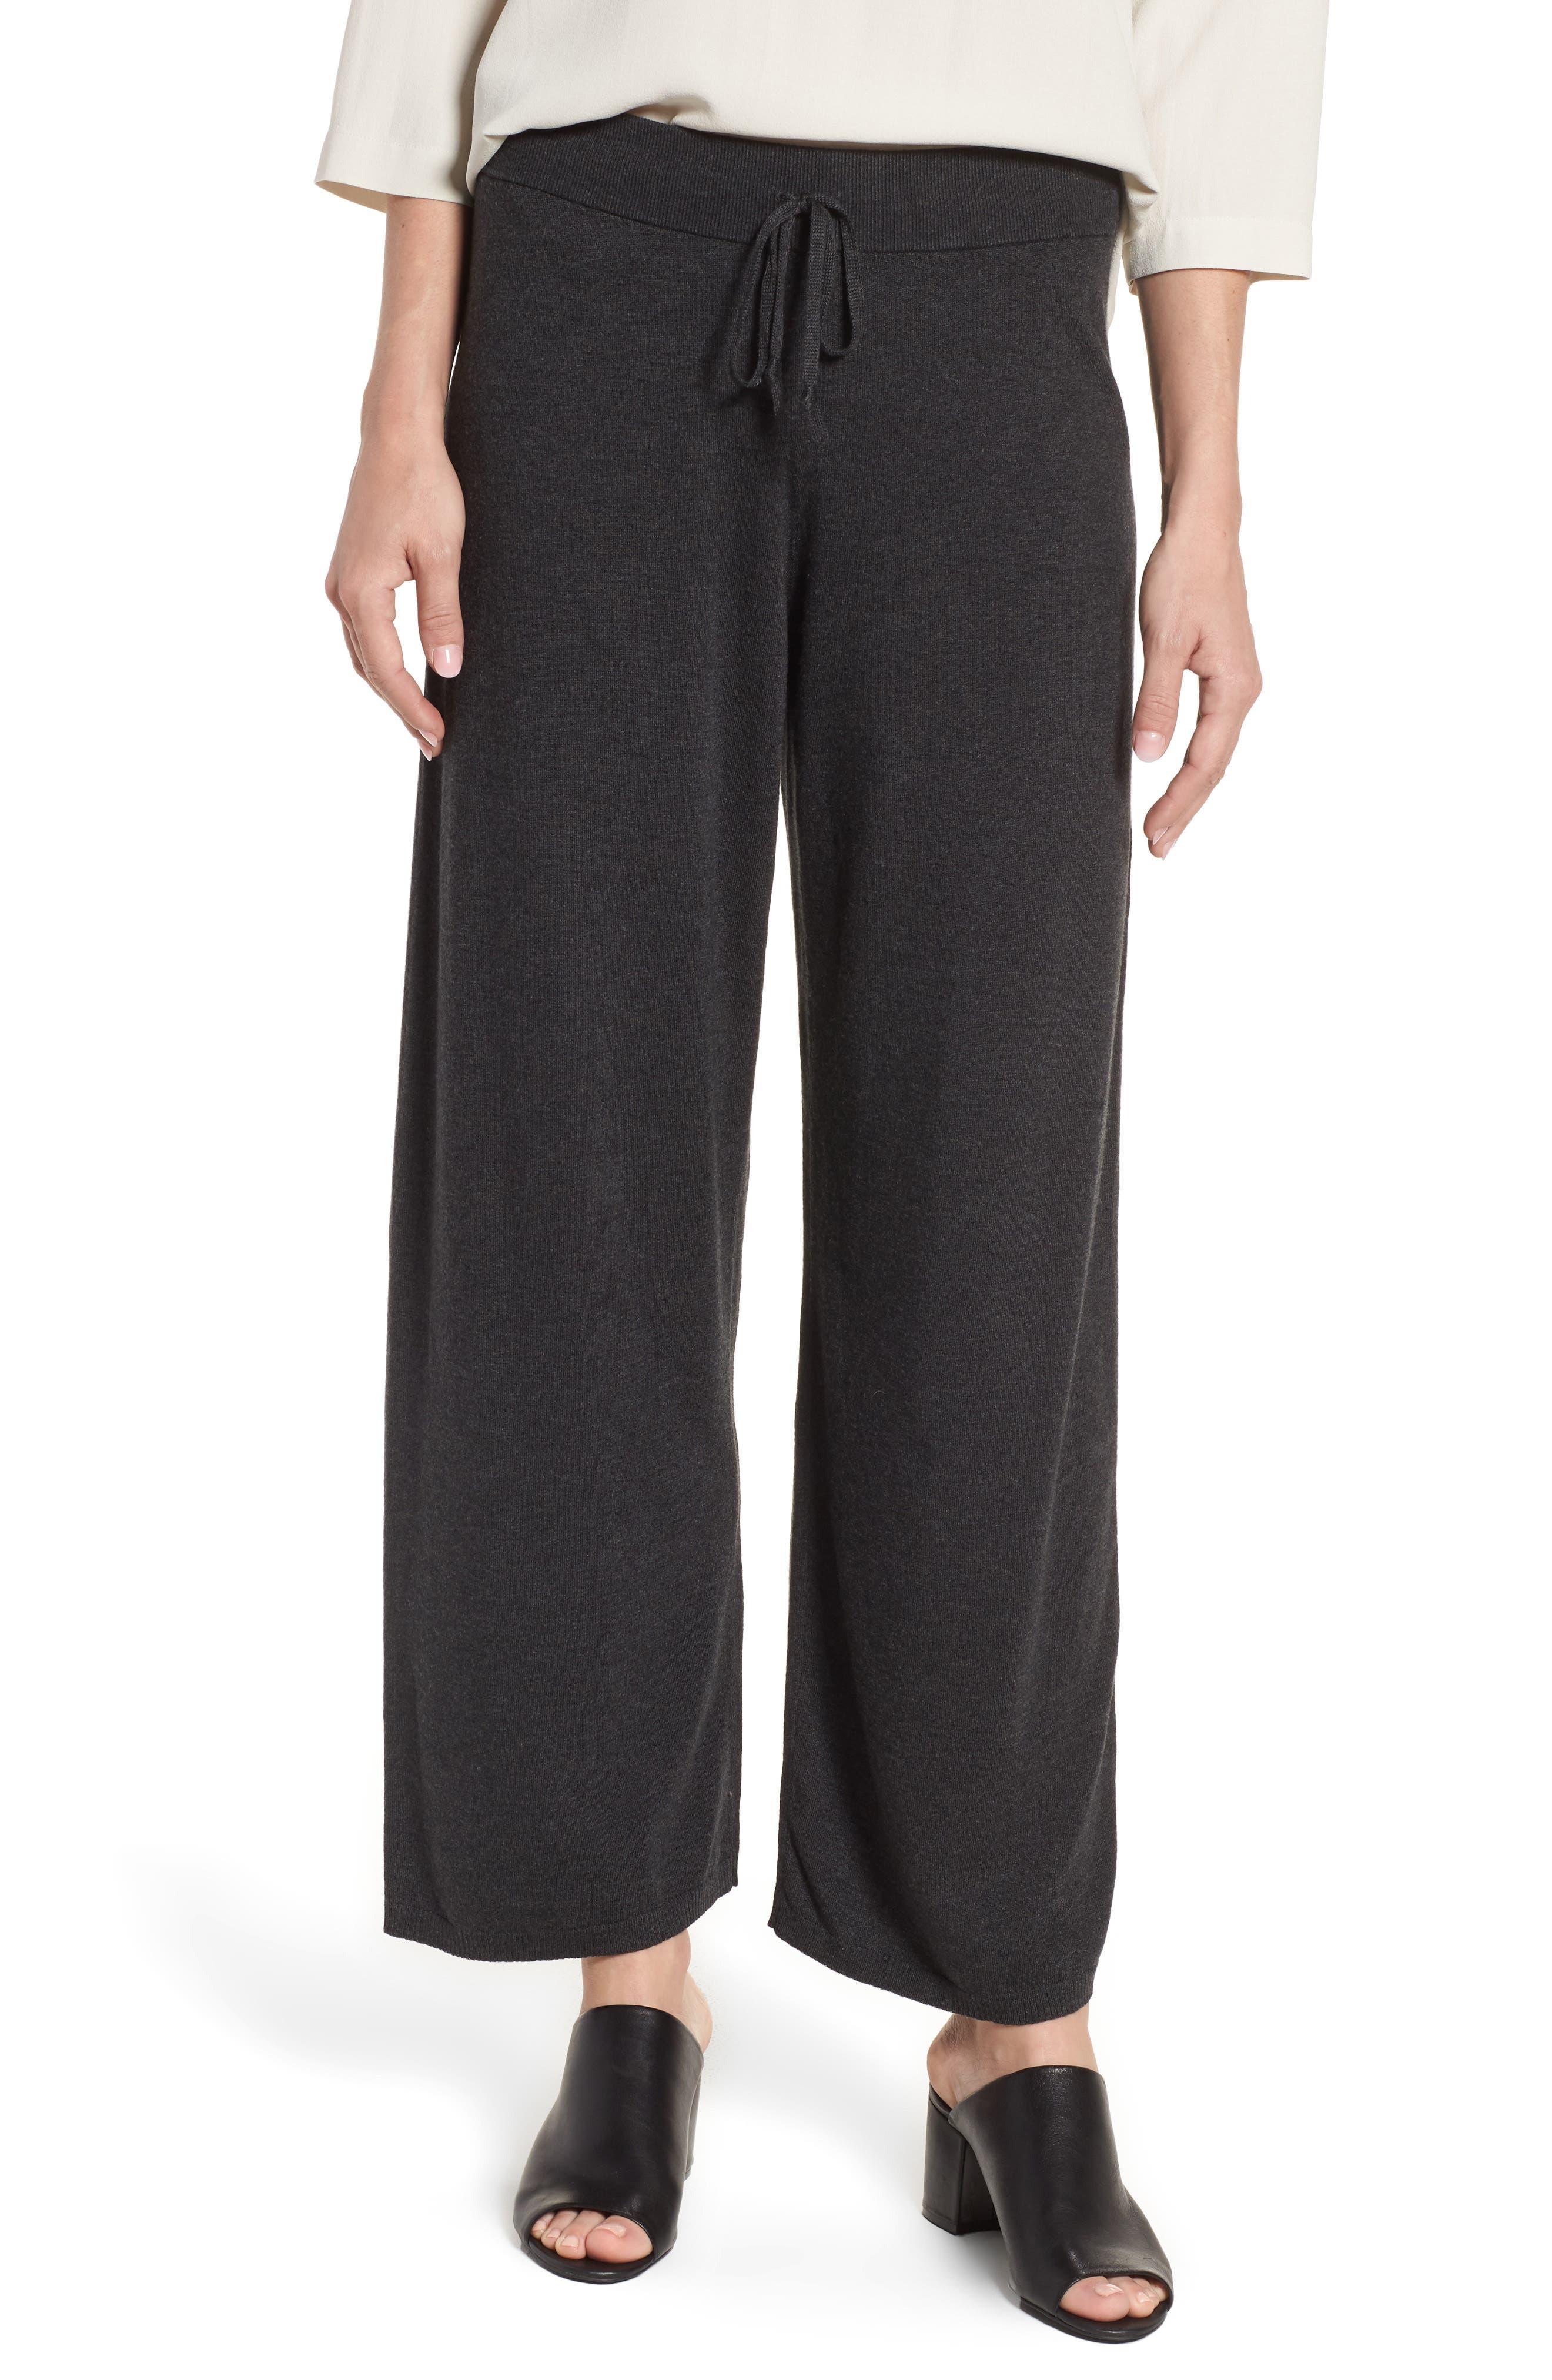 Alternate Image 1 Selected - Eileen Fisher Tencel® Blend Knit Wide Leg Pants